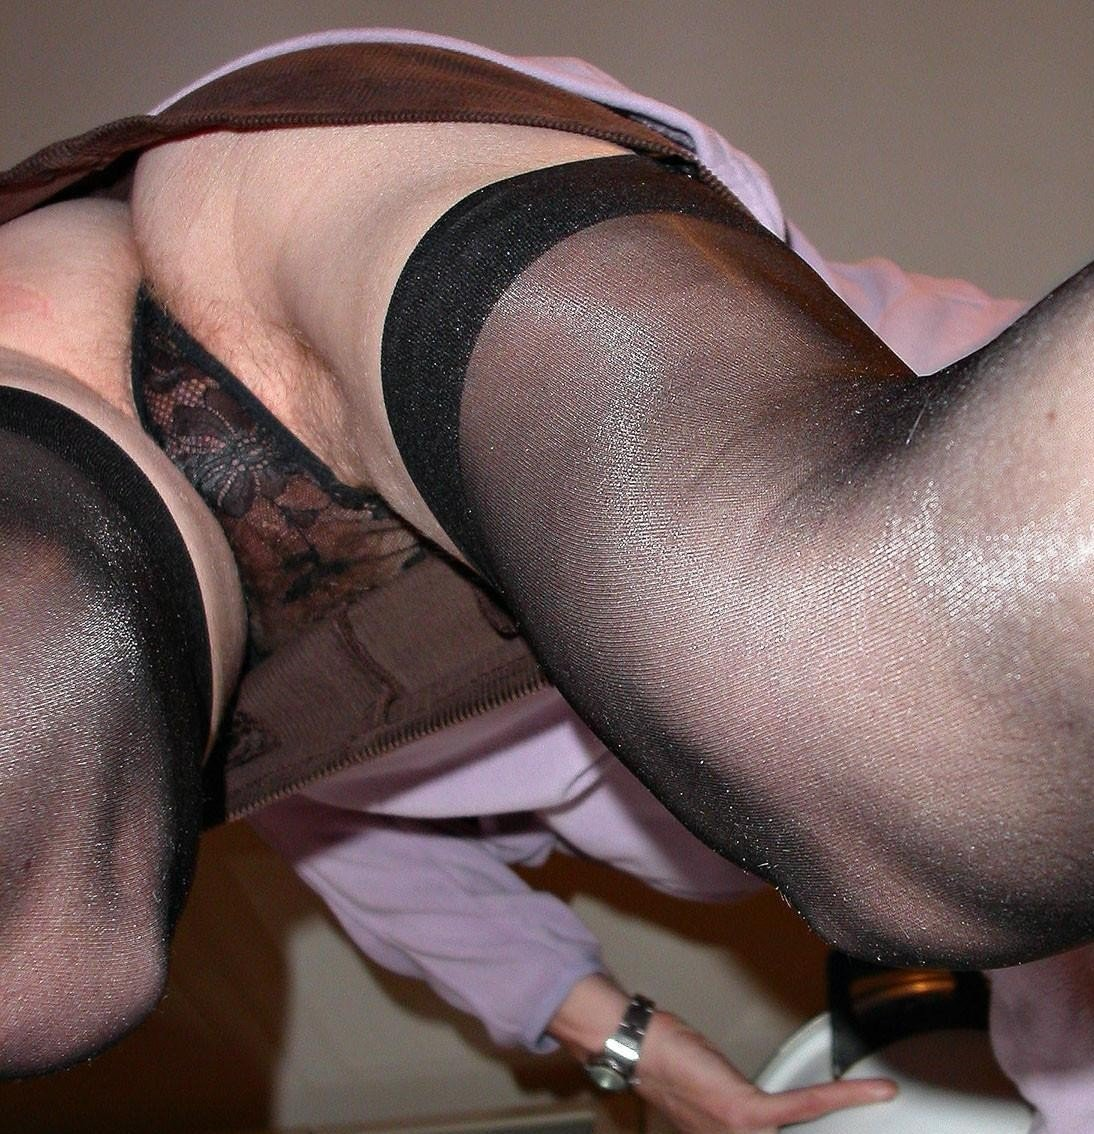 Женские киски и ножки с видом снизу